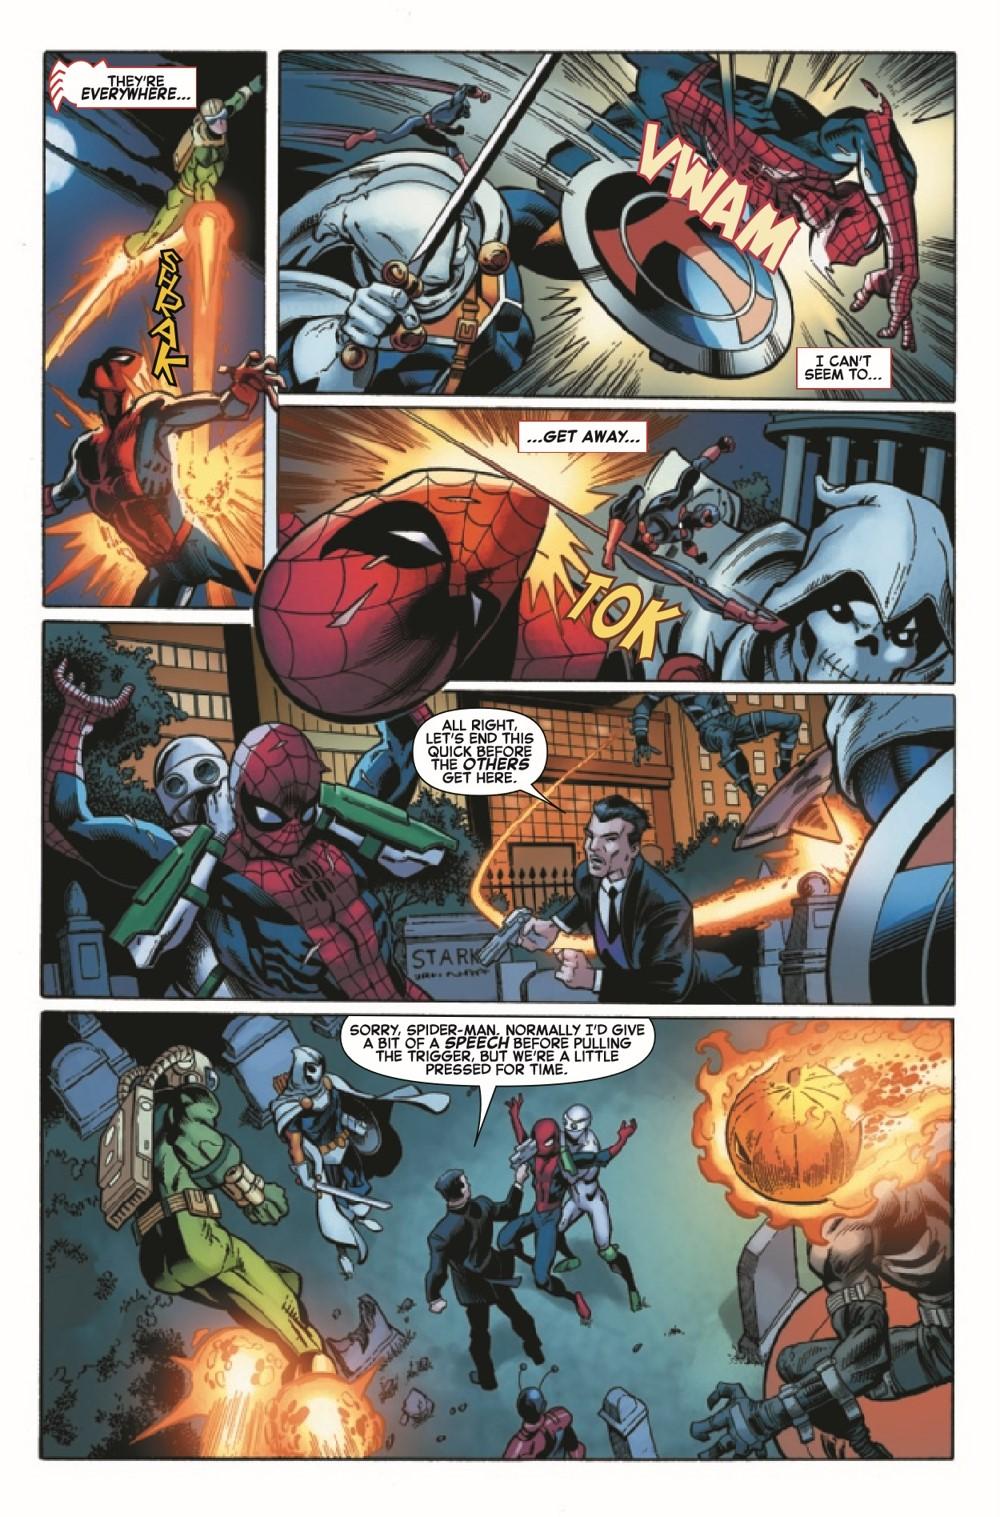 SINISTERWAR2021002_Preview-6 ComicList Previews: SINISTER WAR #2 (OF 4)